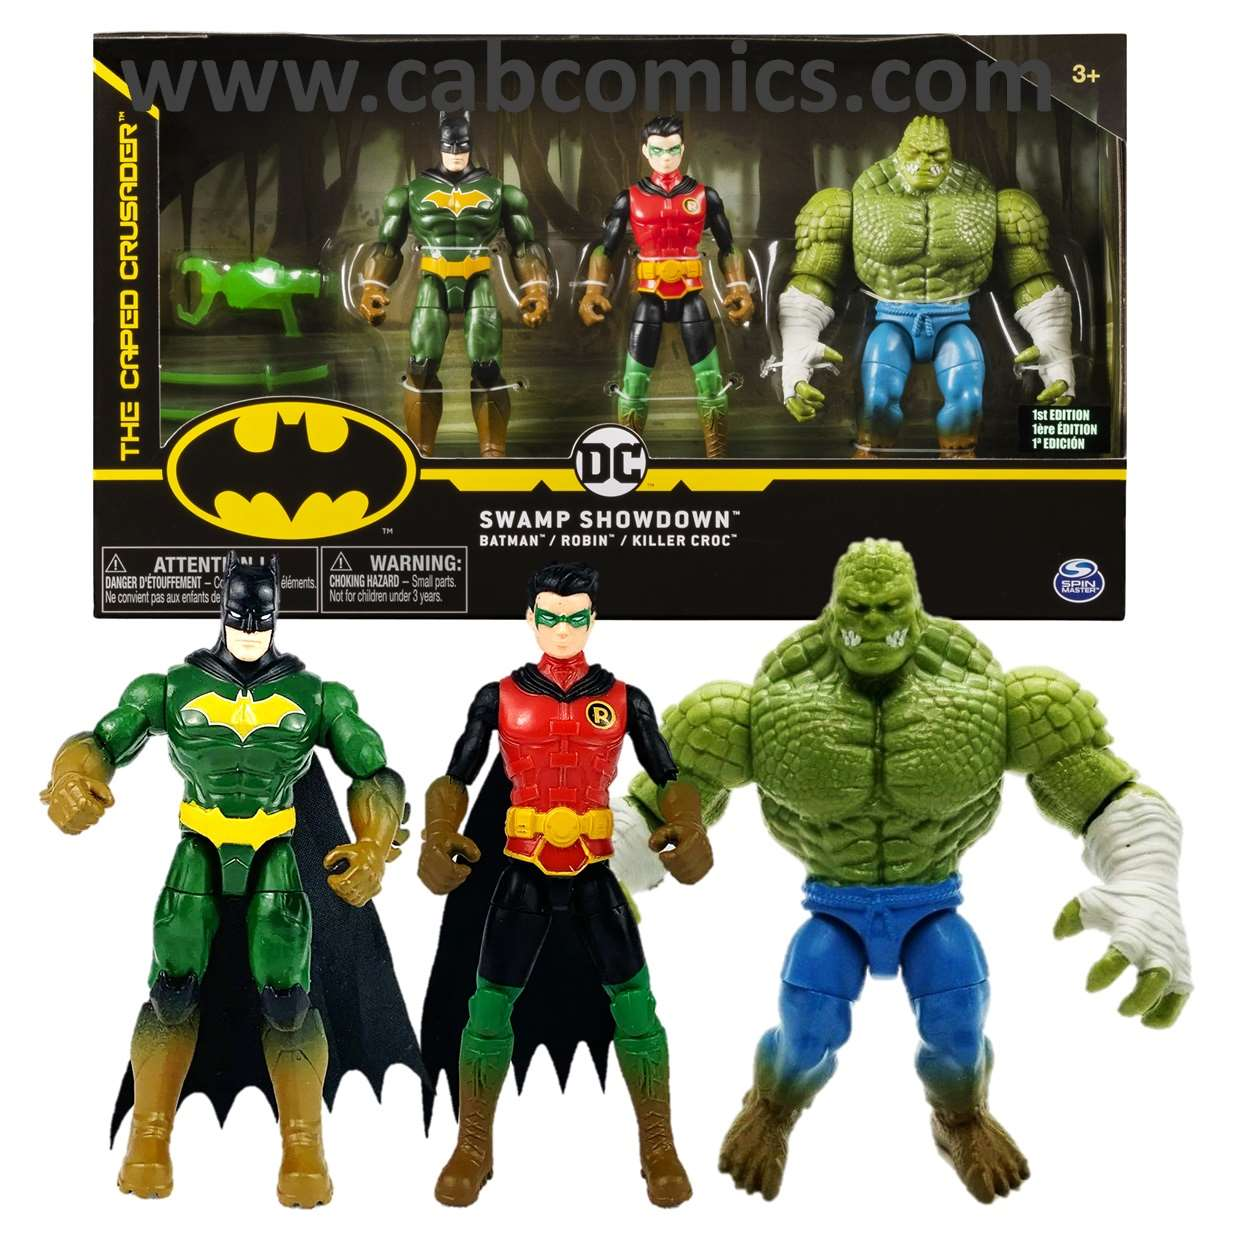 Pack Swamp Showdown Batman, Robin Y Killer Croc Spin Master